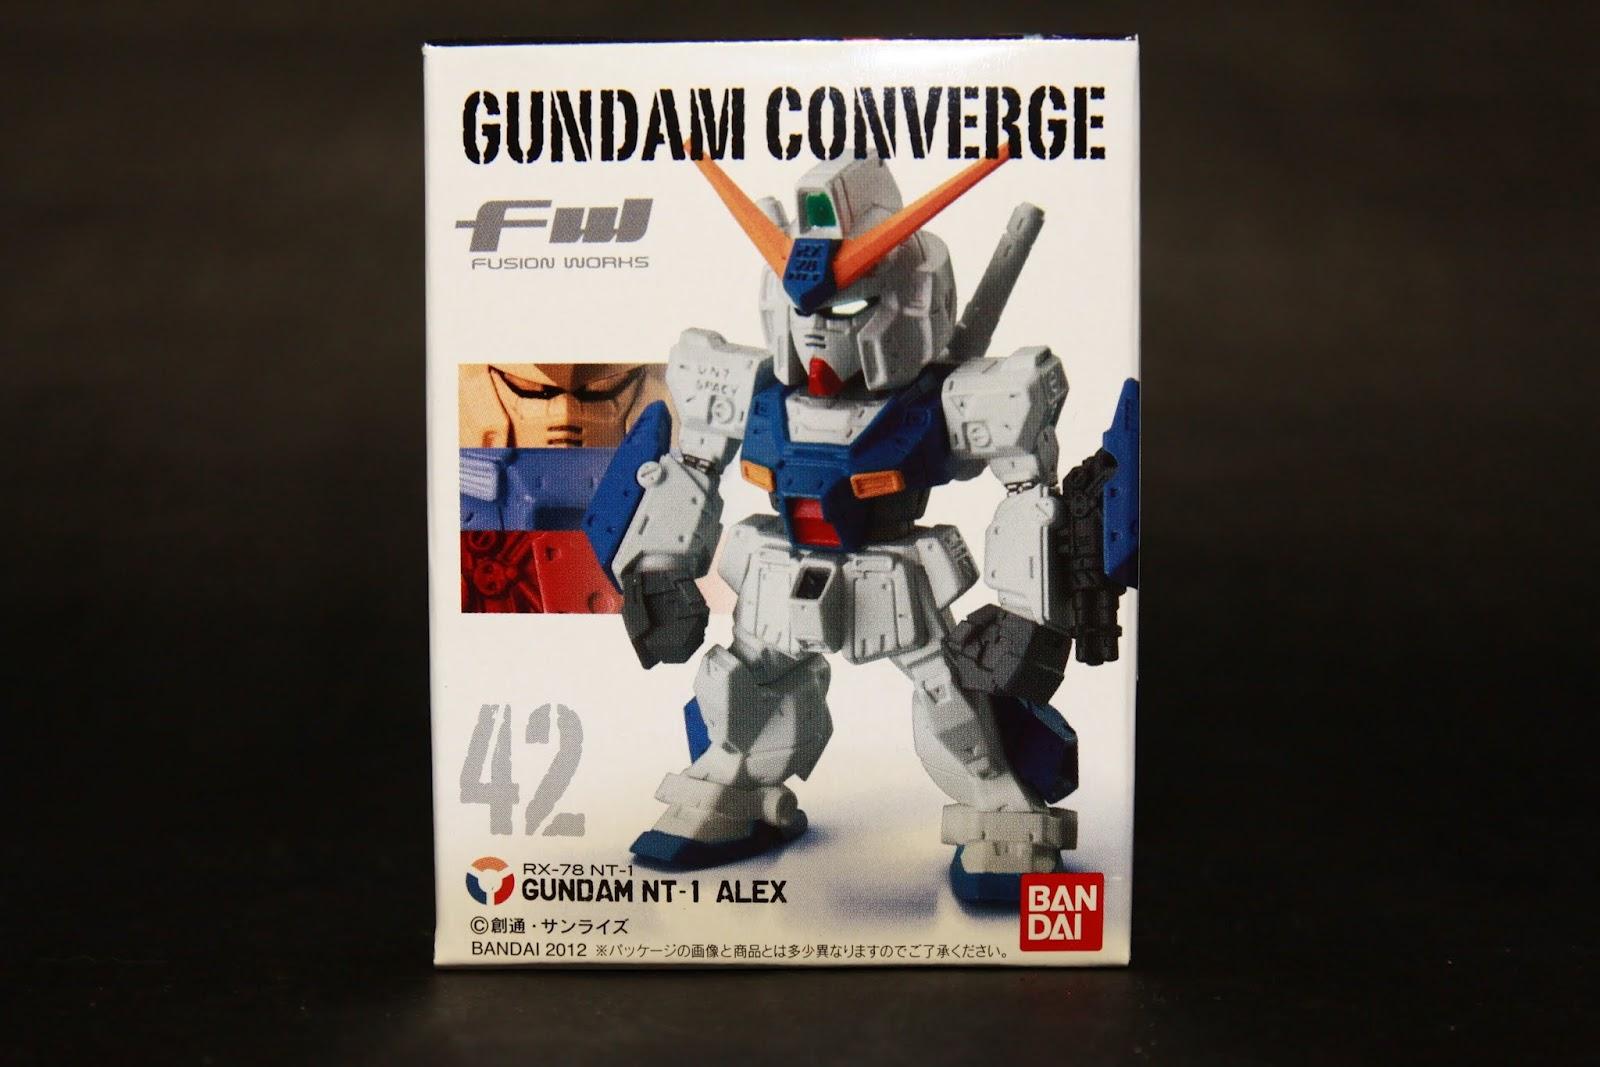 No 42 Gundam NT-1 ALEX